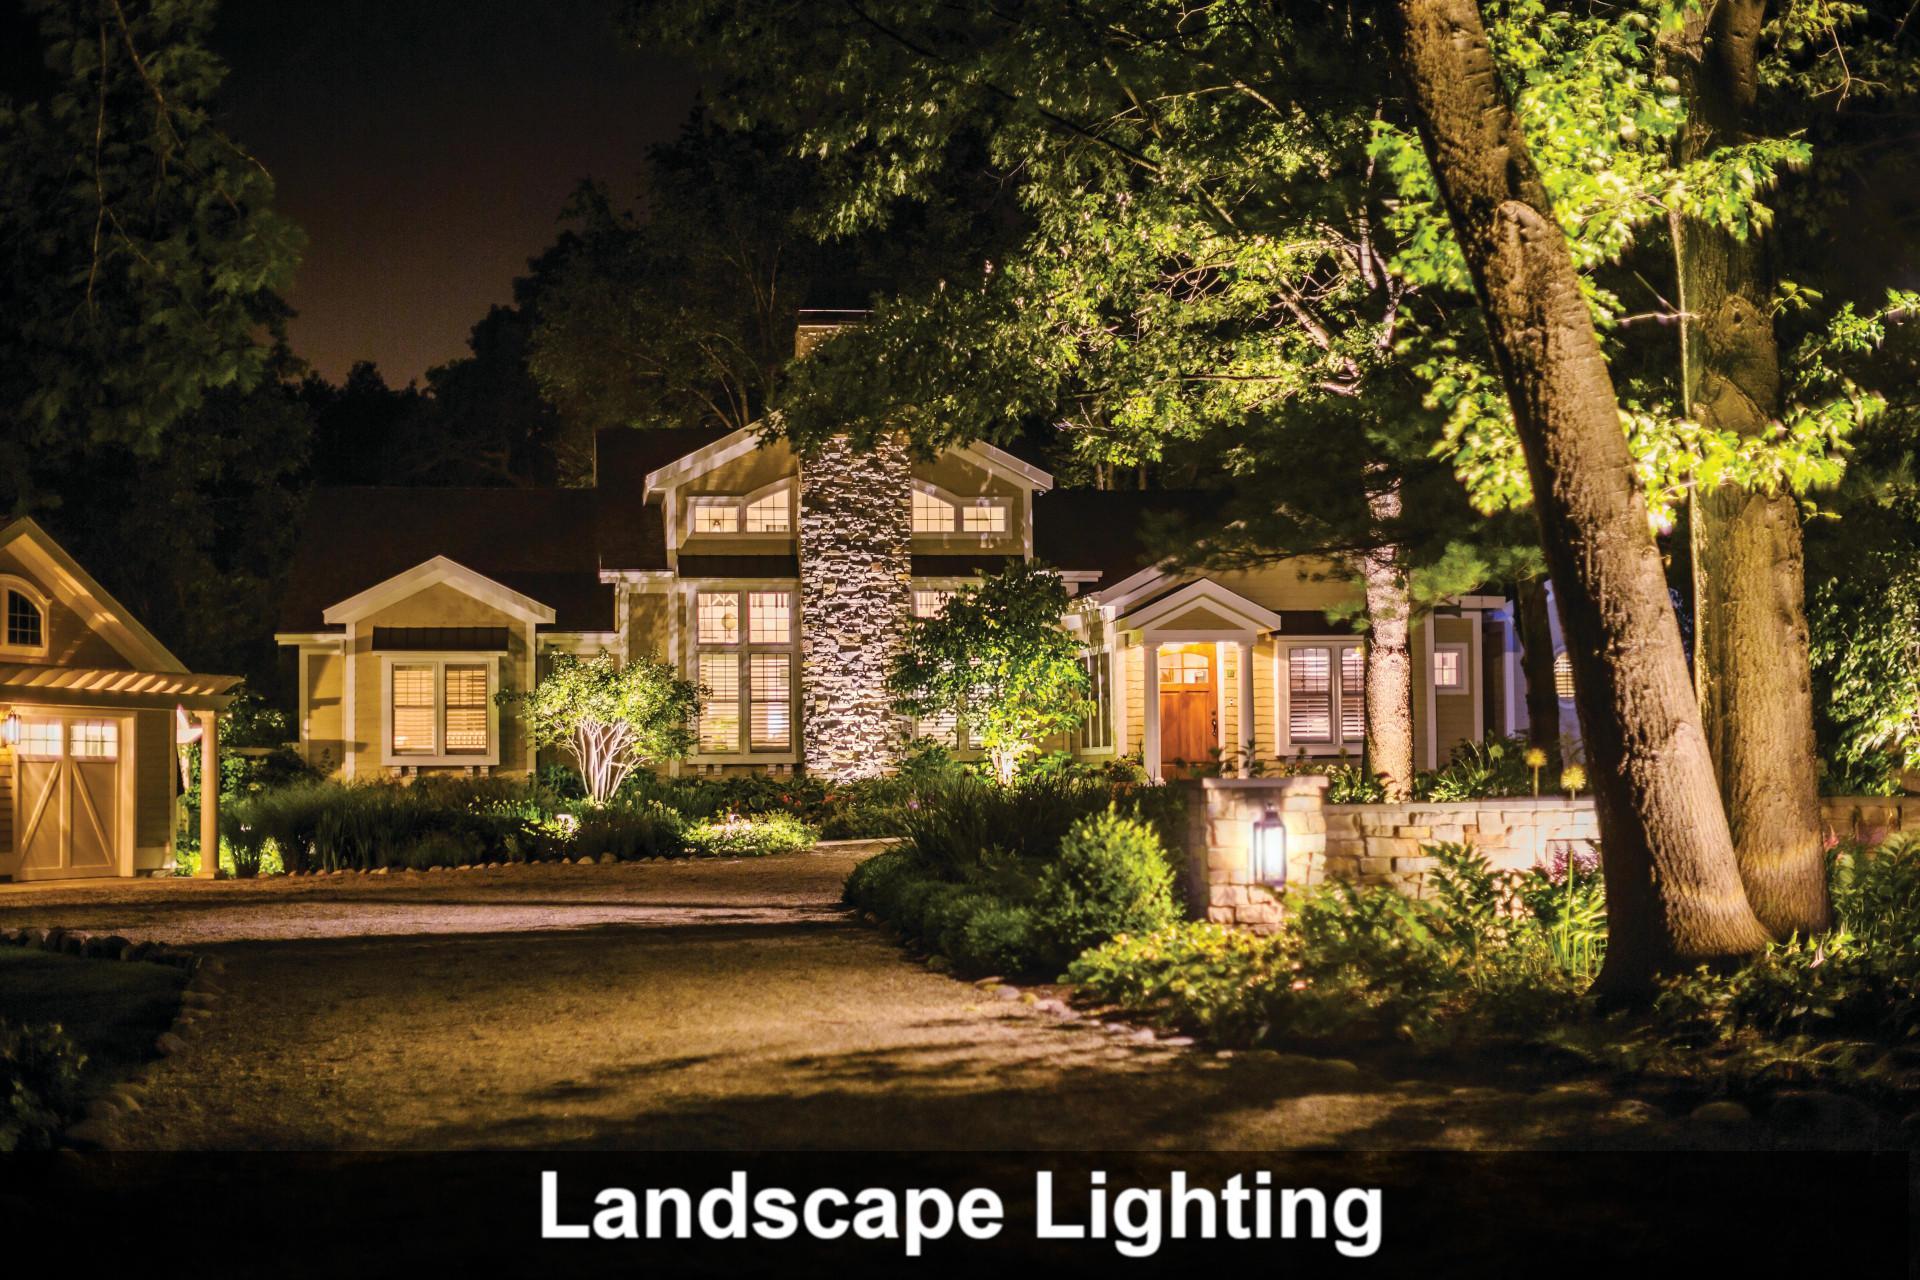 Landscape Lighting Design Installation And Maintenance